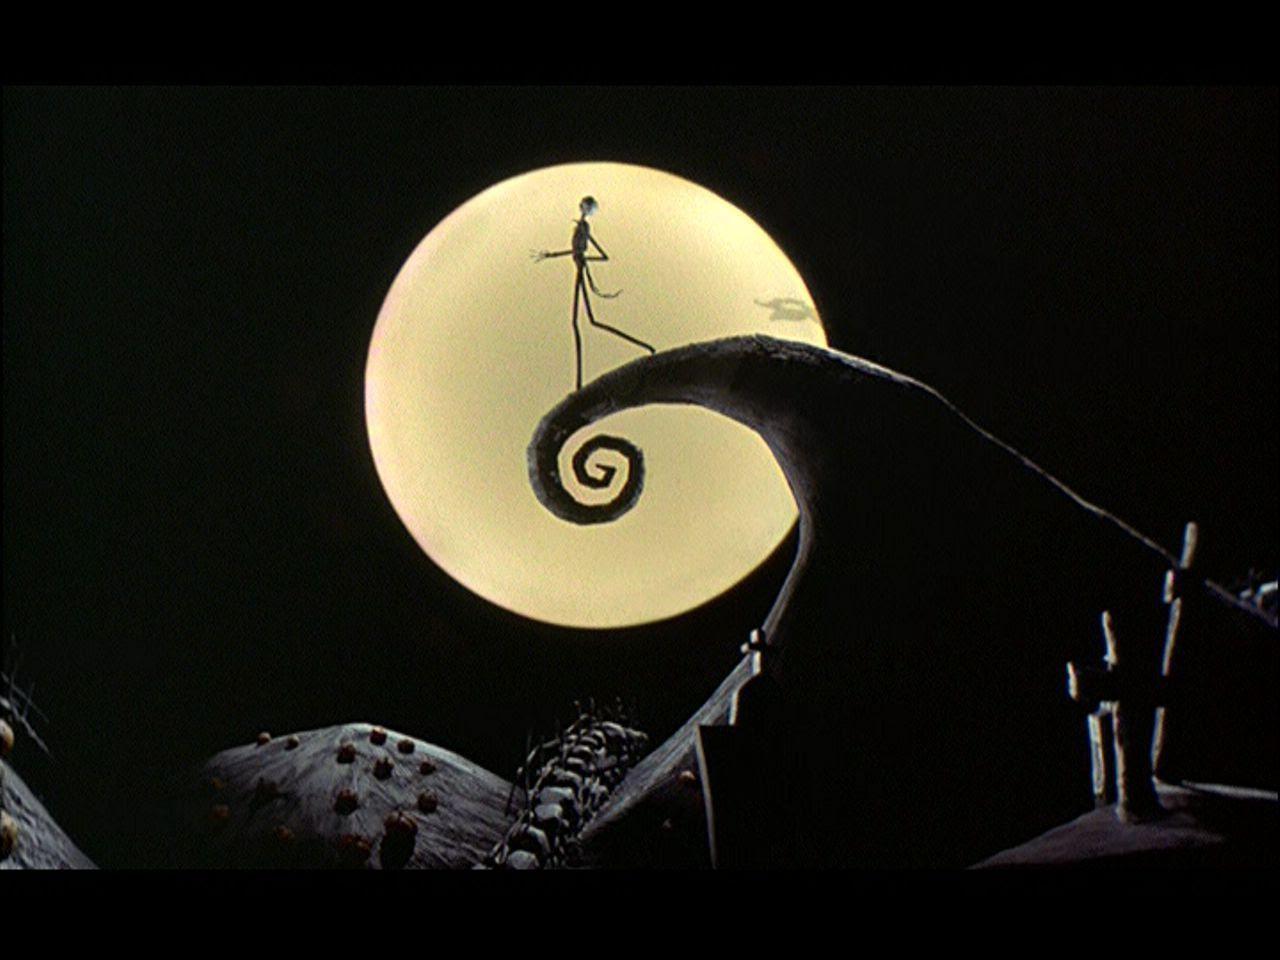 The Nightmare Before Christmas - Nightmare Before Christmas Image ...